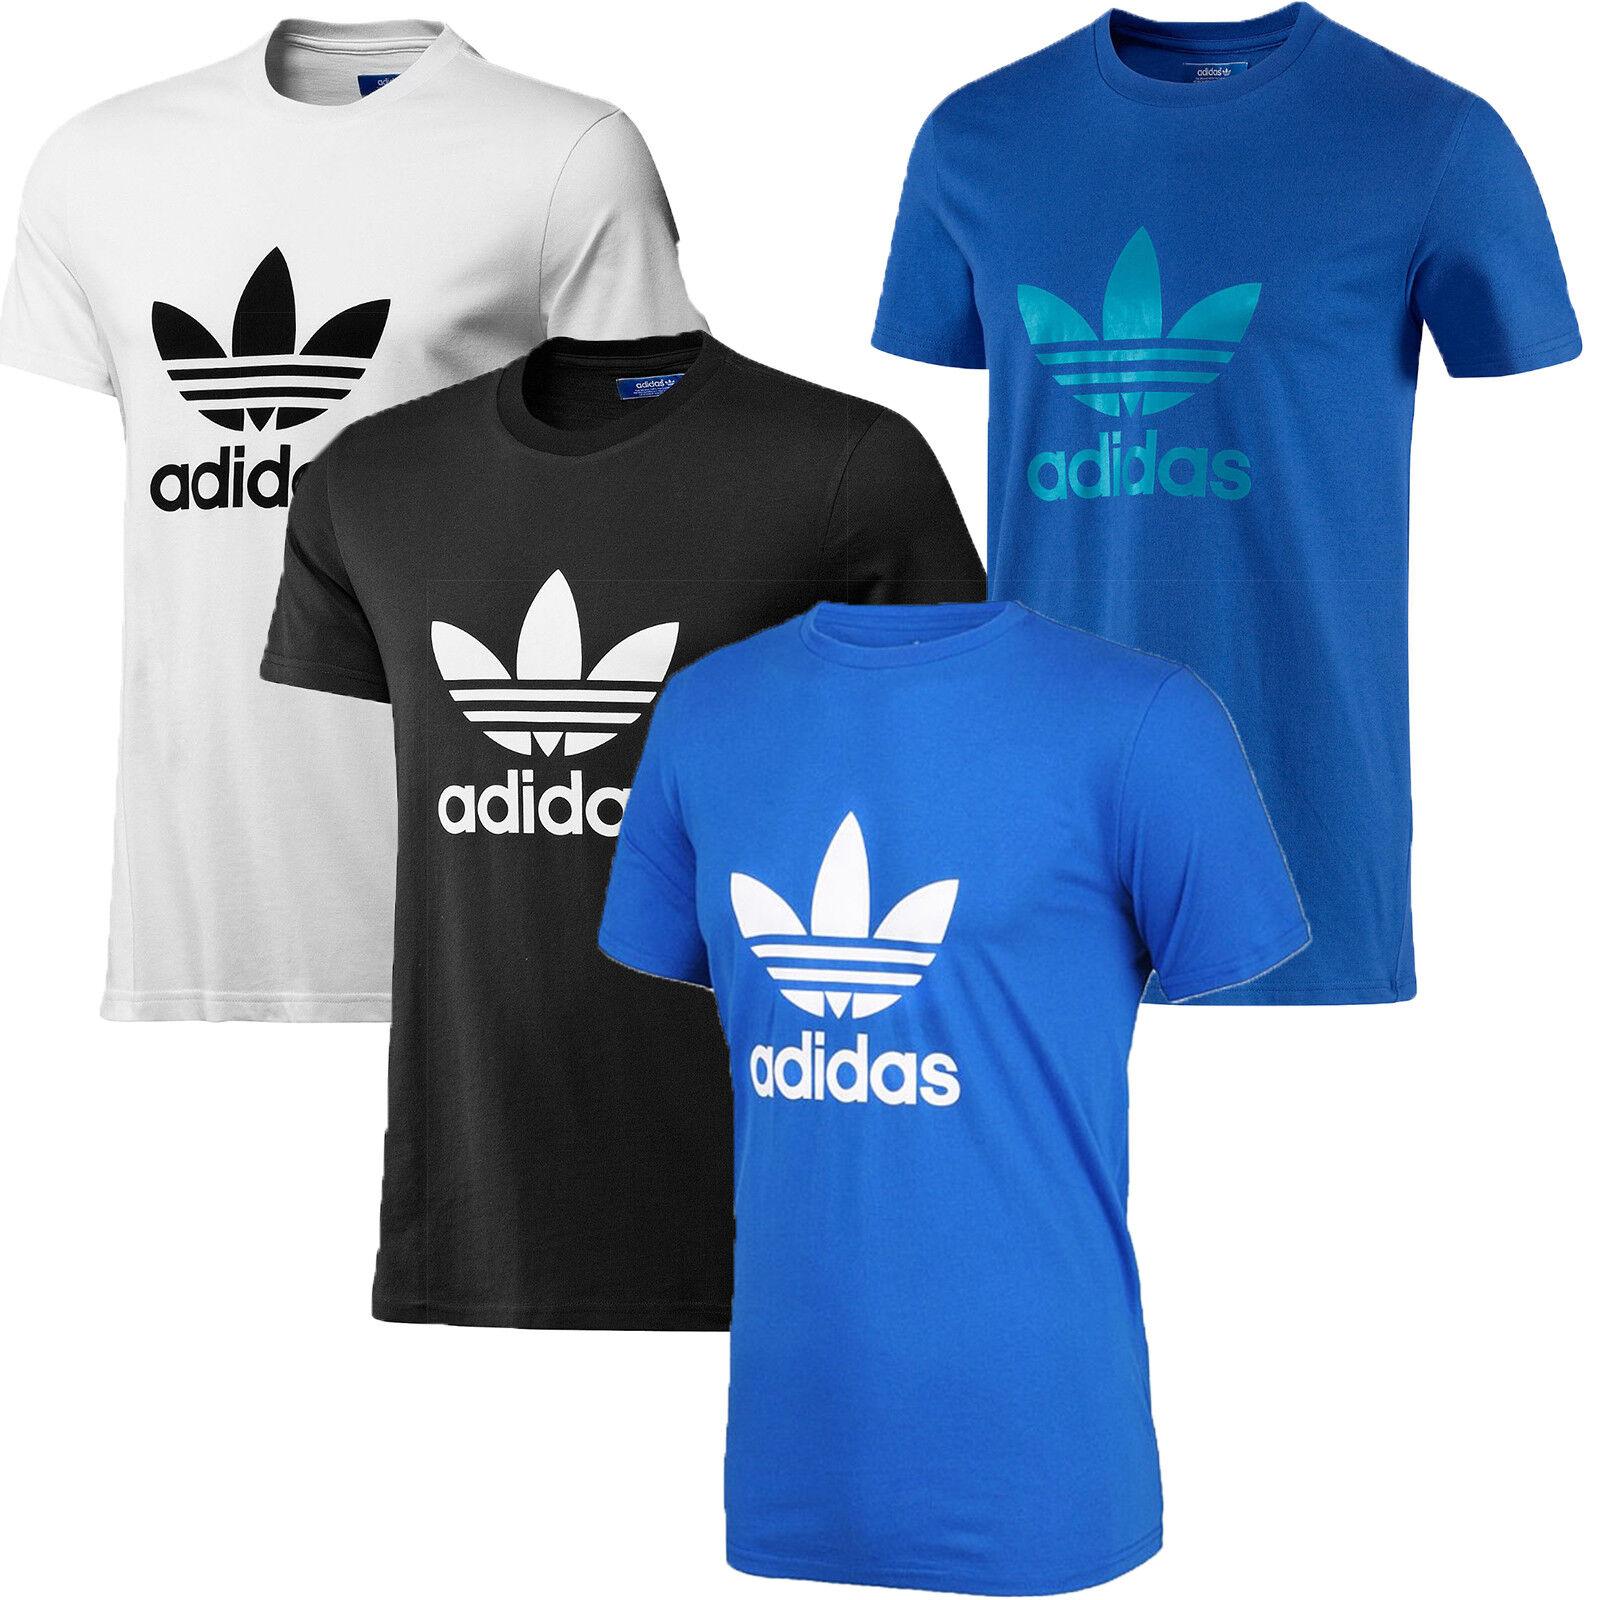 adidas Originals Herren T-Shirt Rundhalsausschnitt Dreiblatt Baumwoll-T-Shirt Neue Größe S M L XL